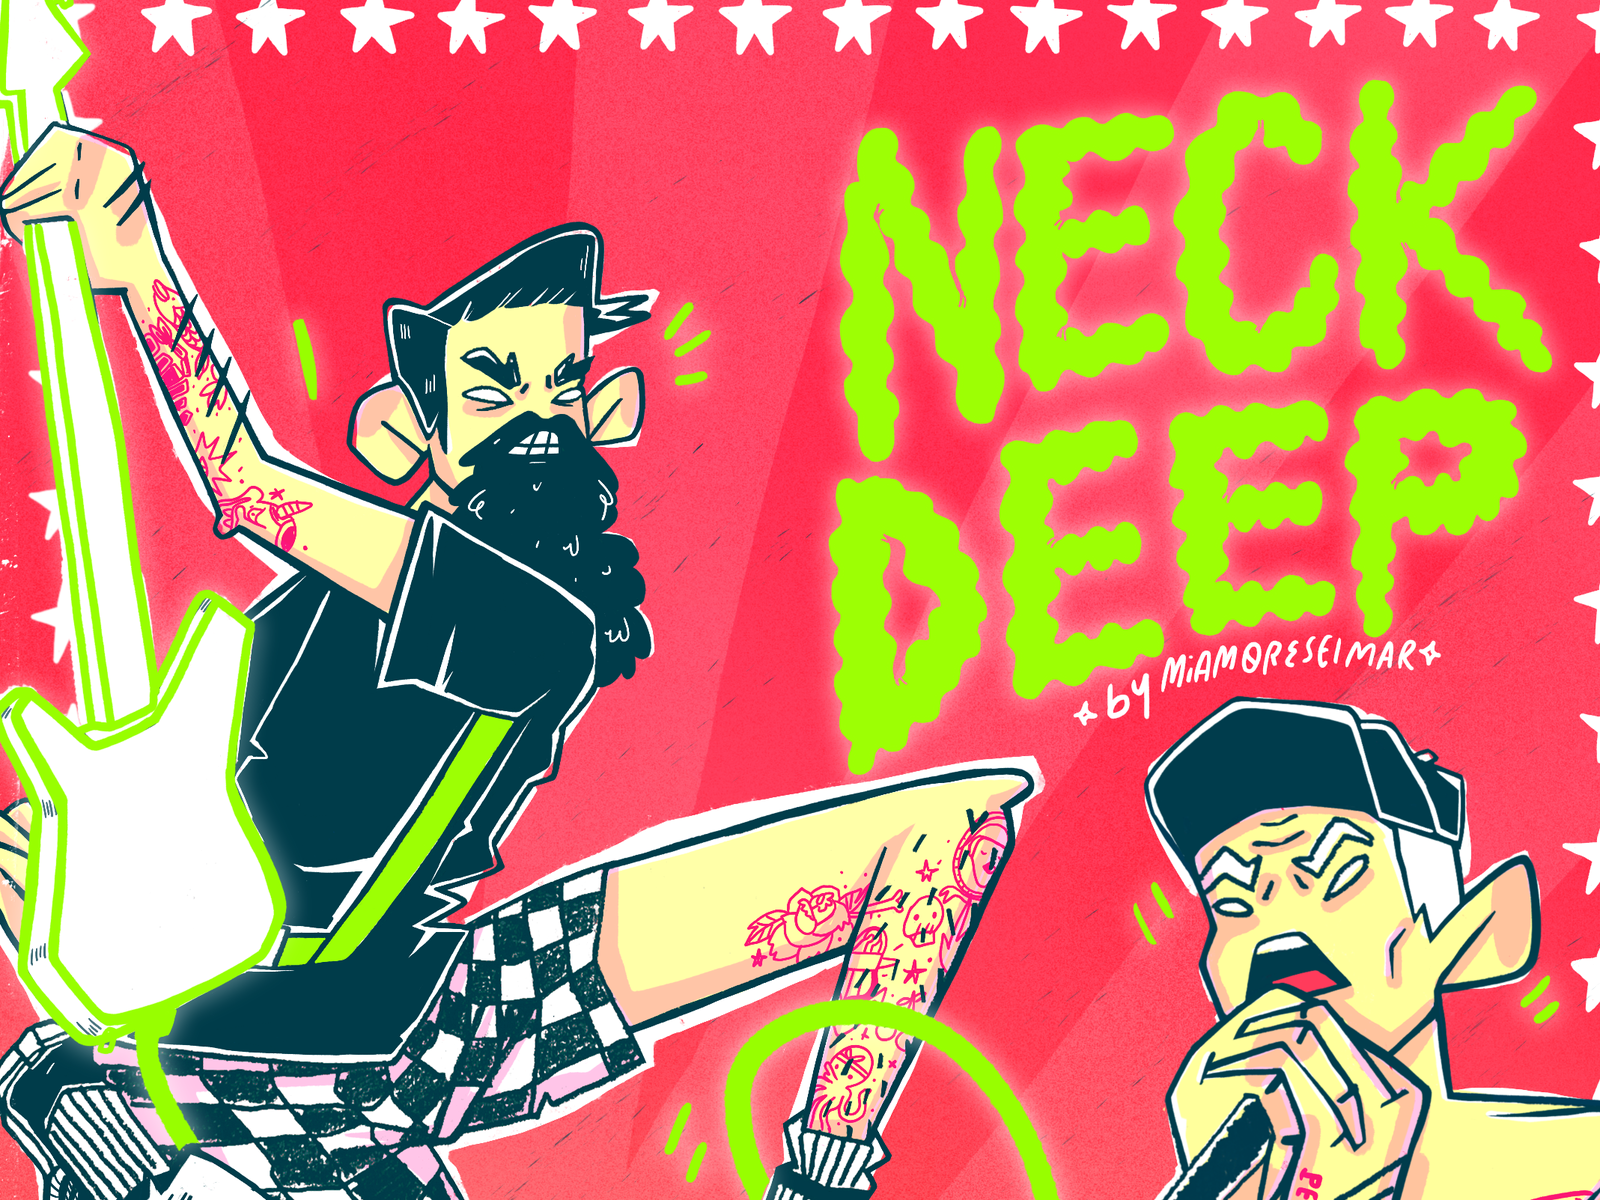 Neck Deep Procreate Lettering Illustration Fanart Cartel Music Digitalart Charactedesign Punk Rock Band Poster